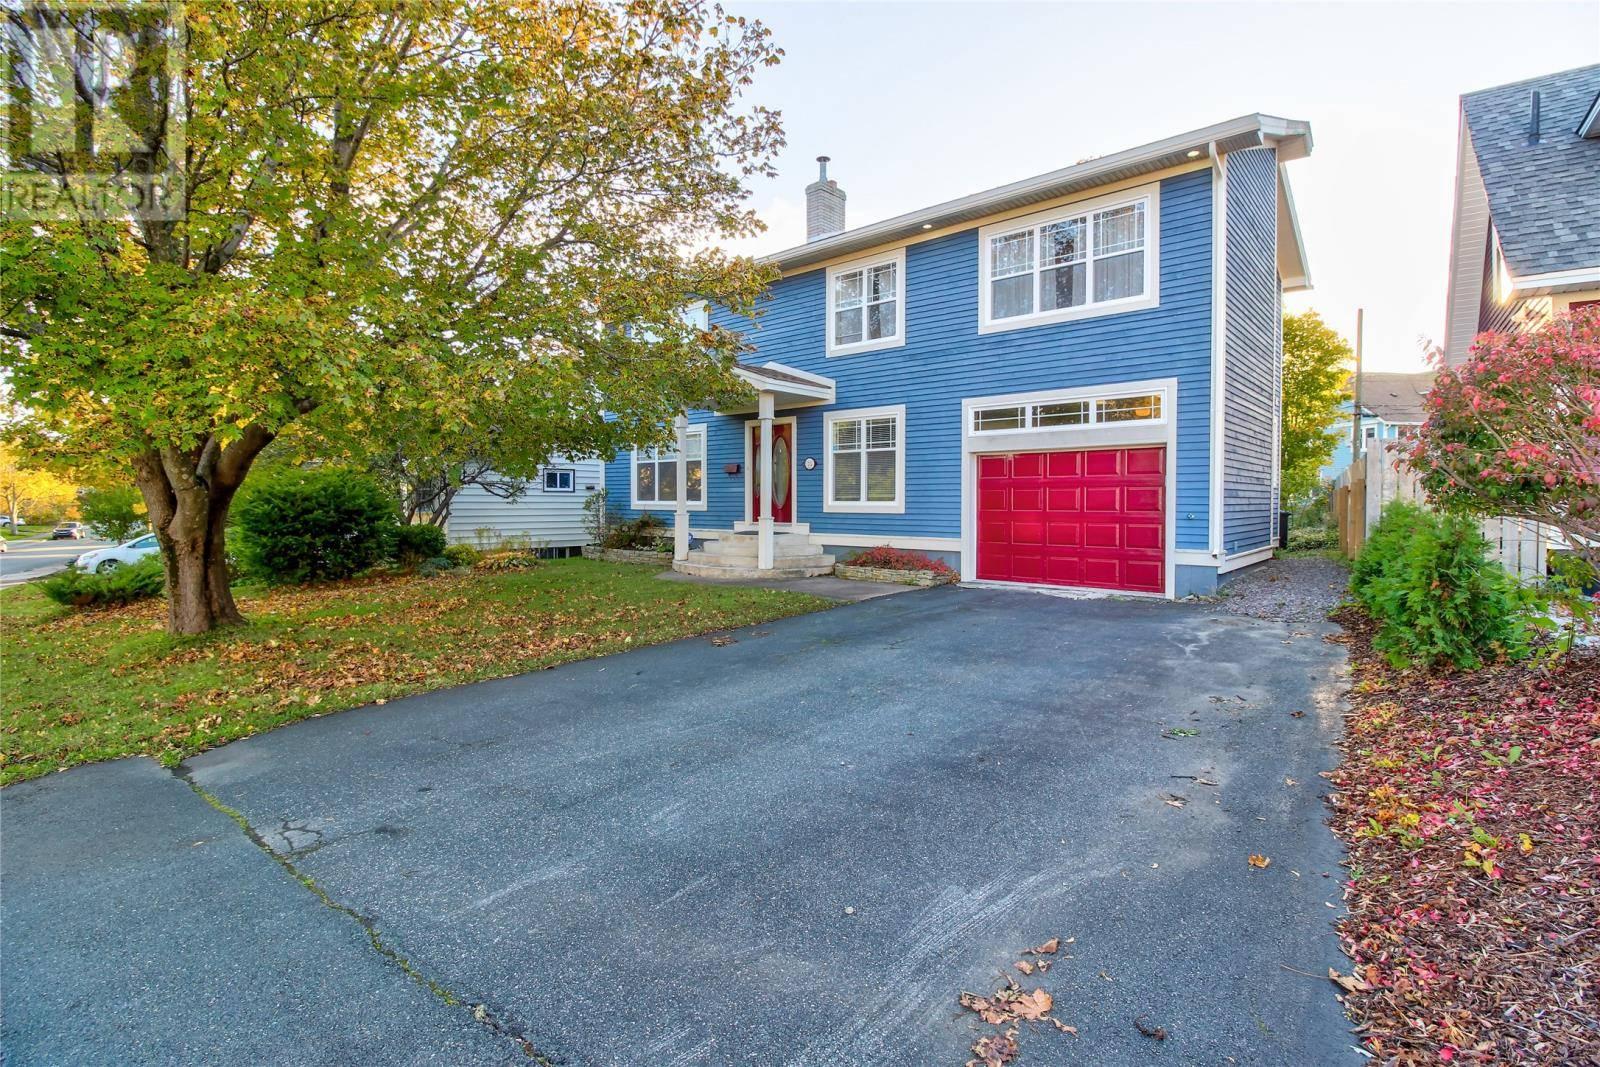 House for sale at 75 Carpasian Rd St. John's Newfoundland - MLS: 1206753